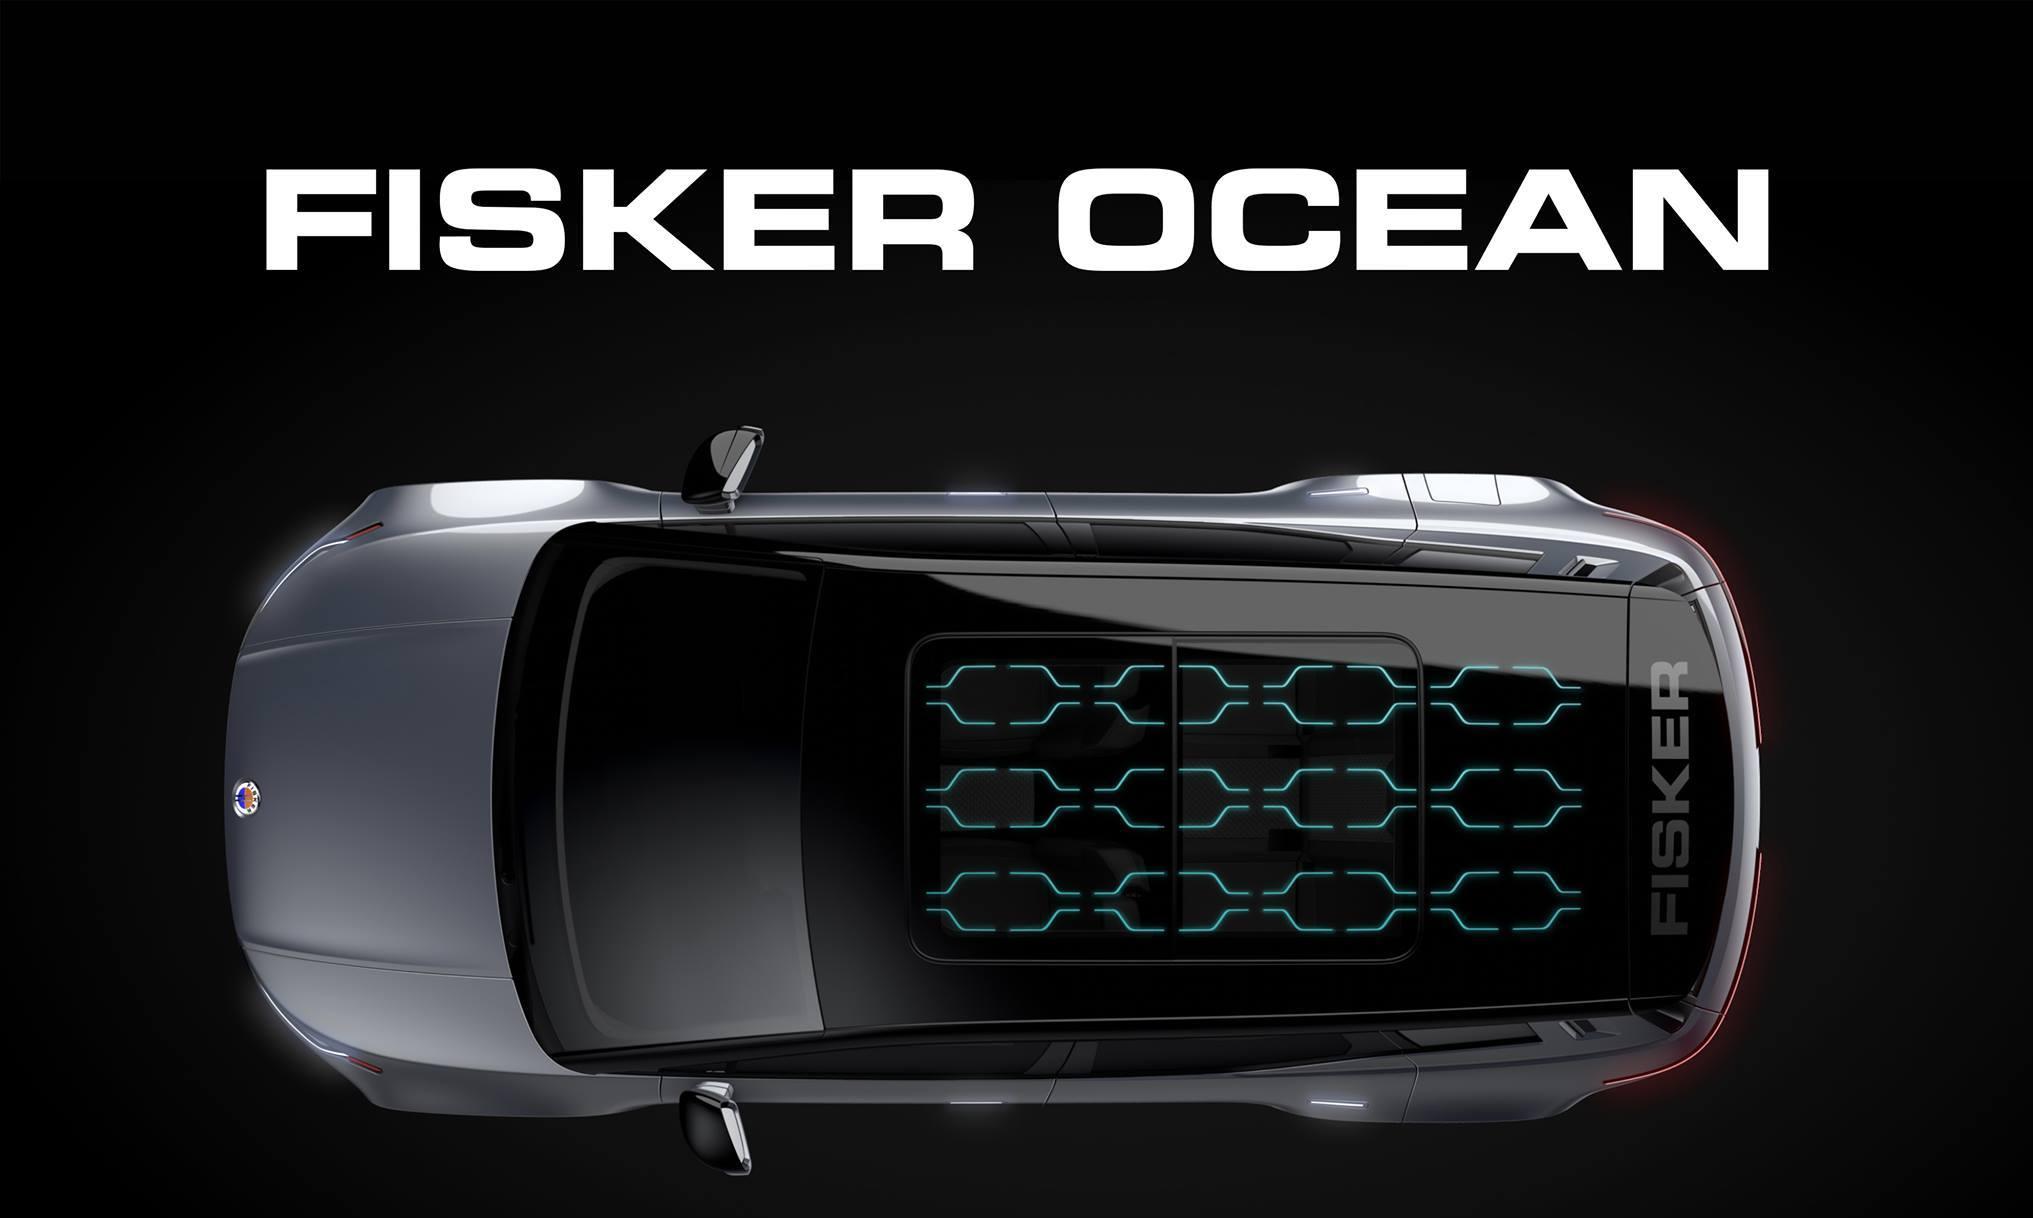 fisker-ocean-2021-electric-car.jpg